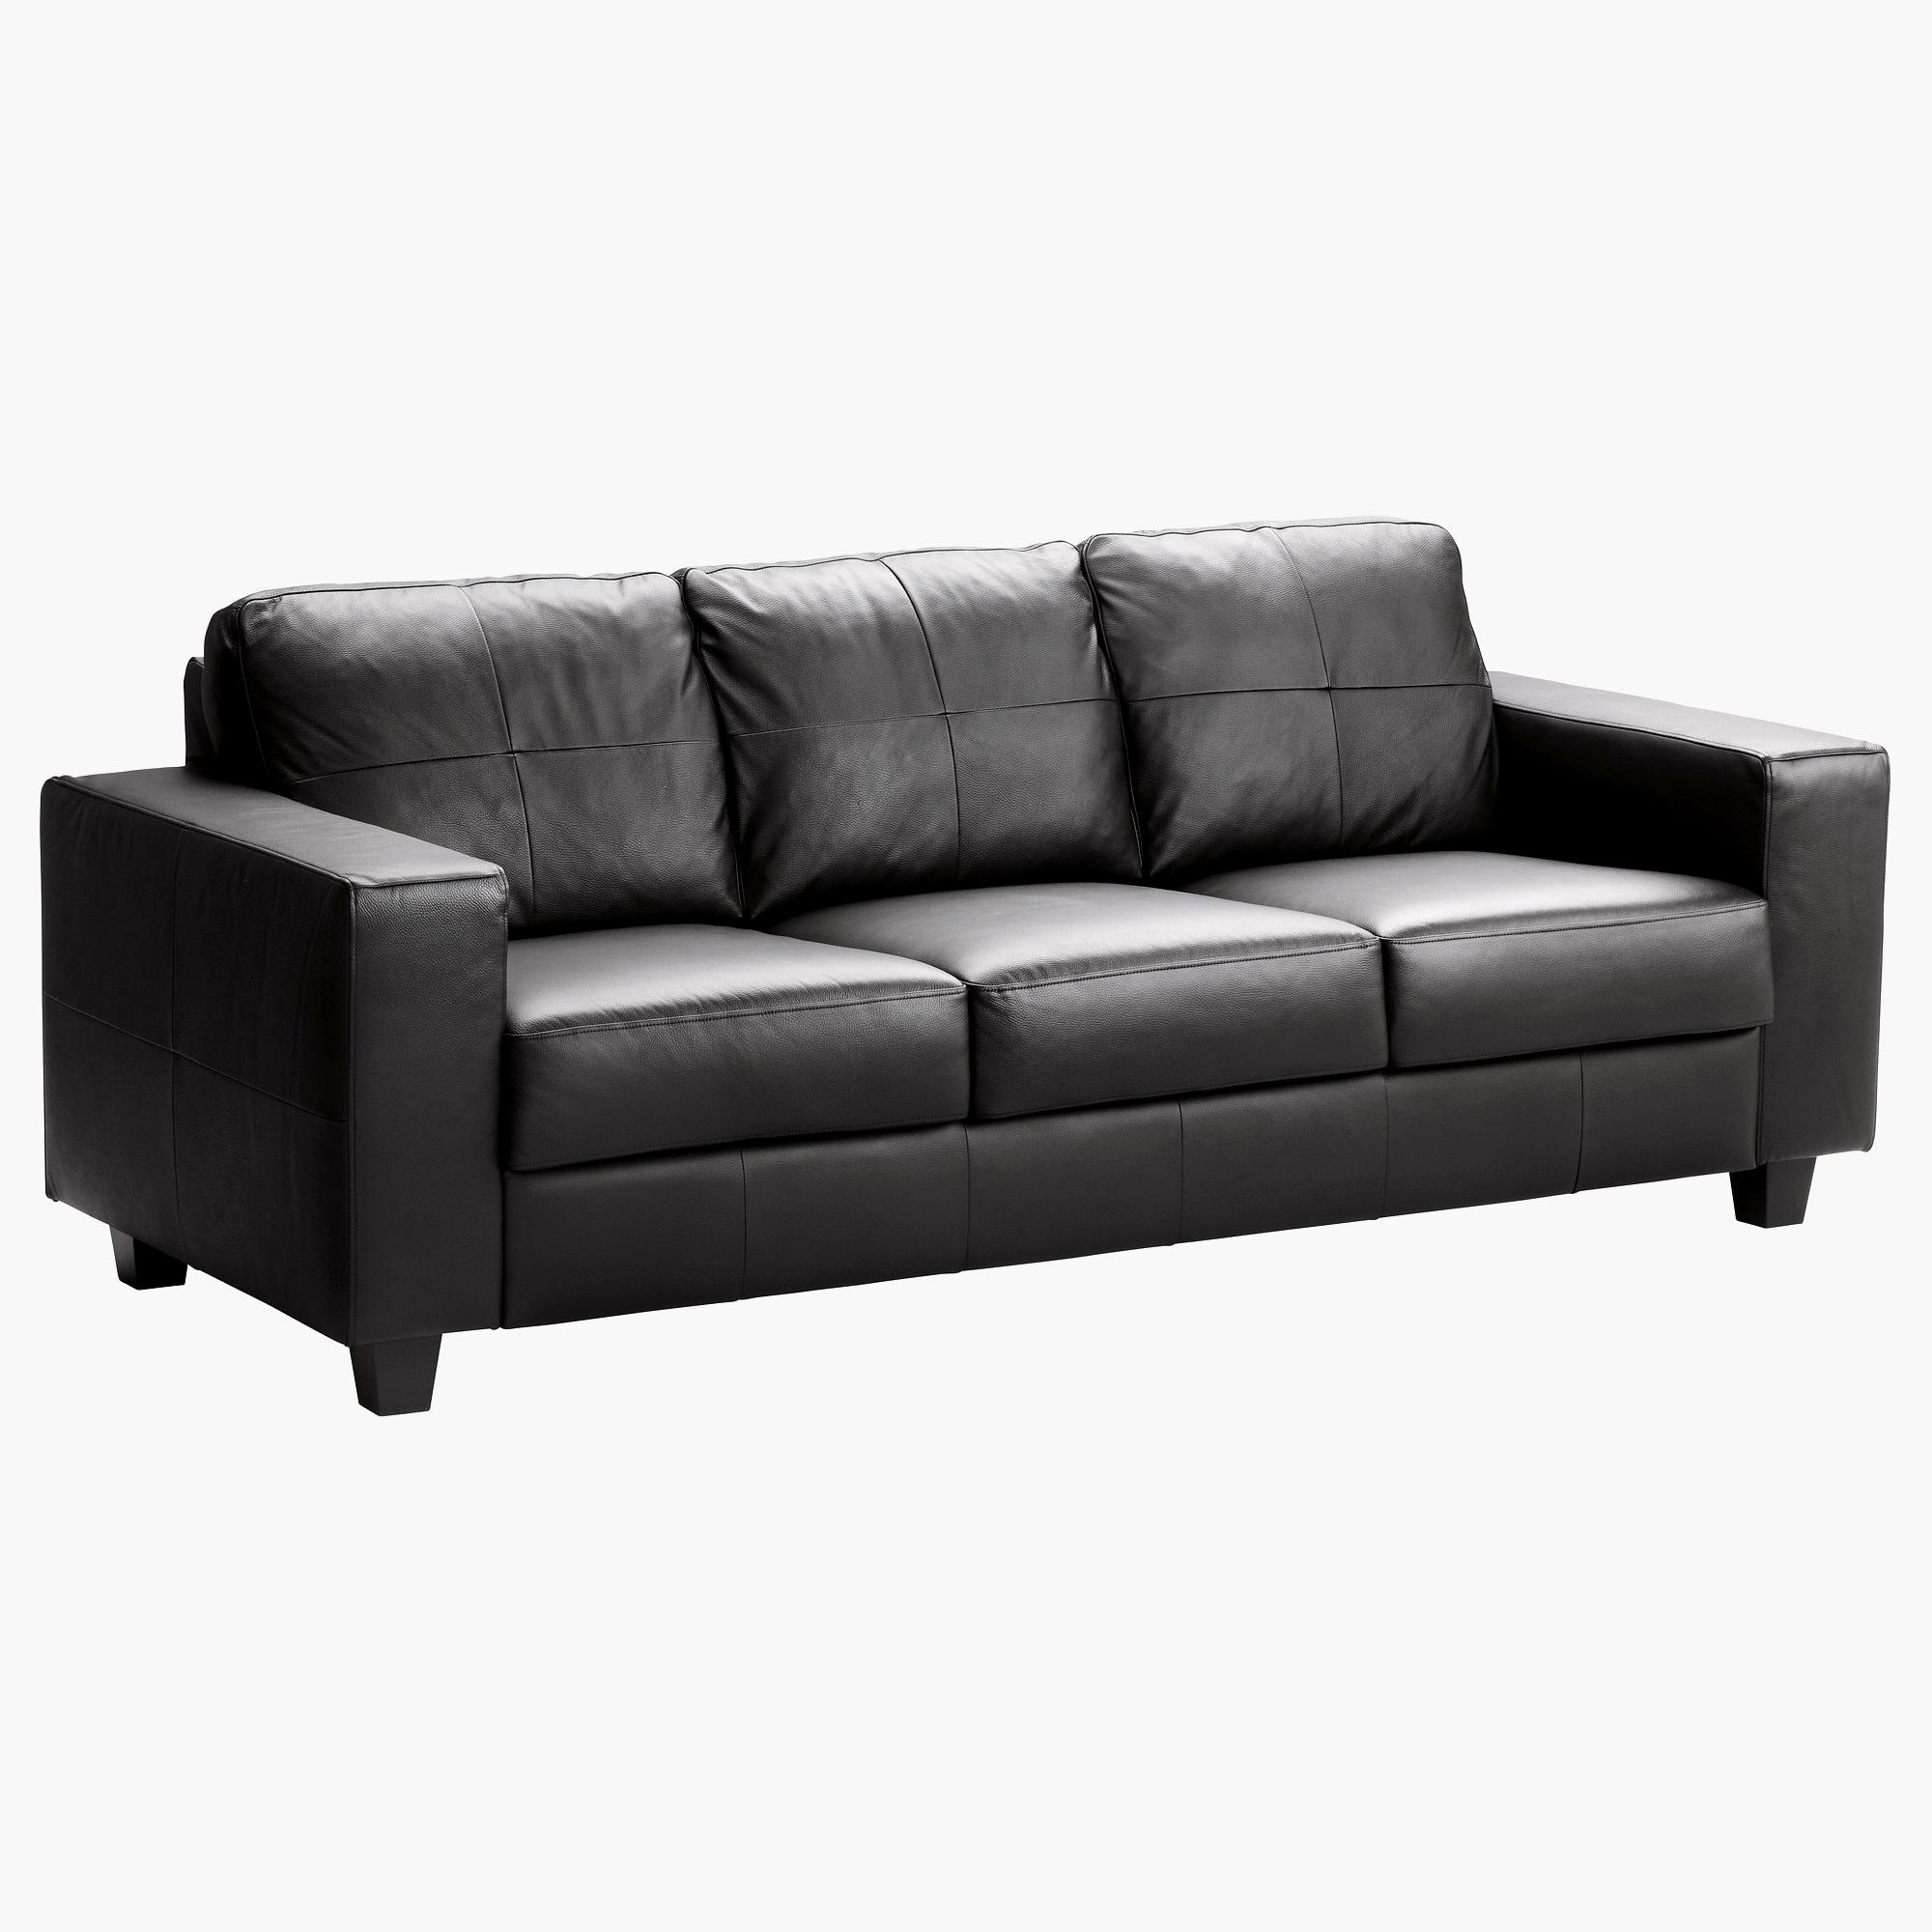 Telas Para Cubrir sofas Ikea Whdr Telas Para Cubrir sofas Ikea sofà S De 3 Plazas De Piel Y Piel